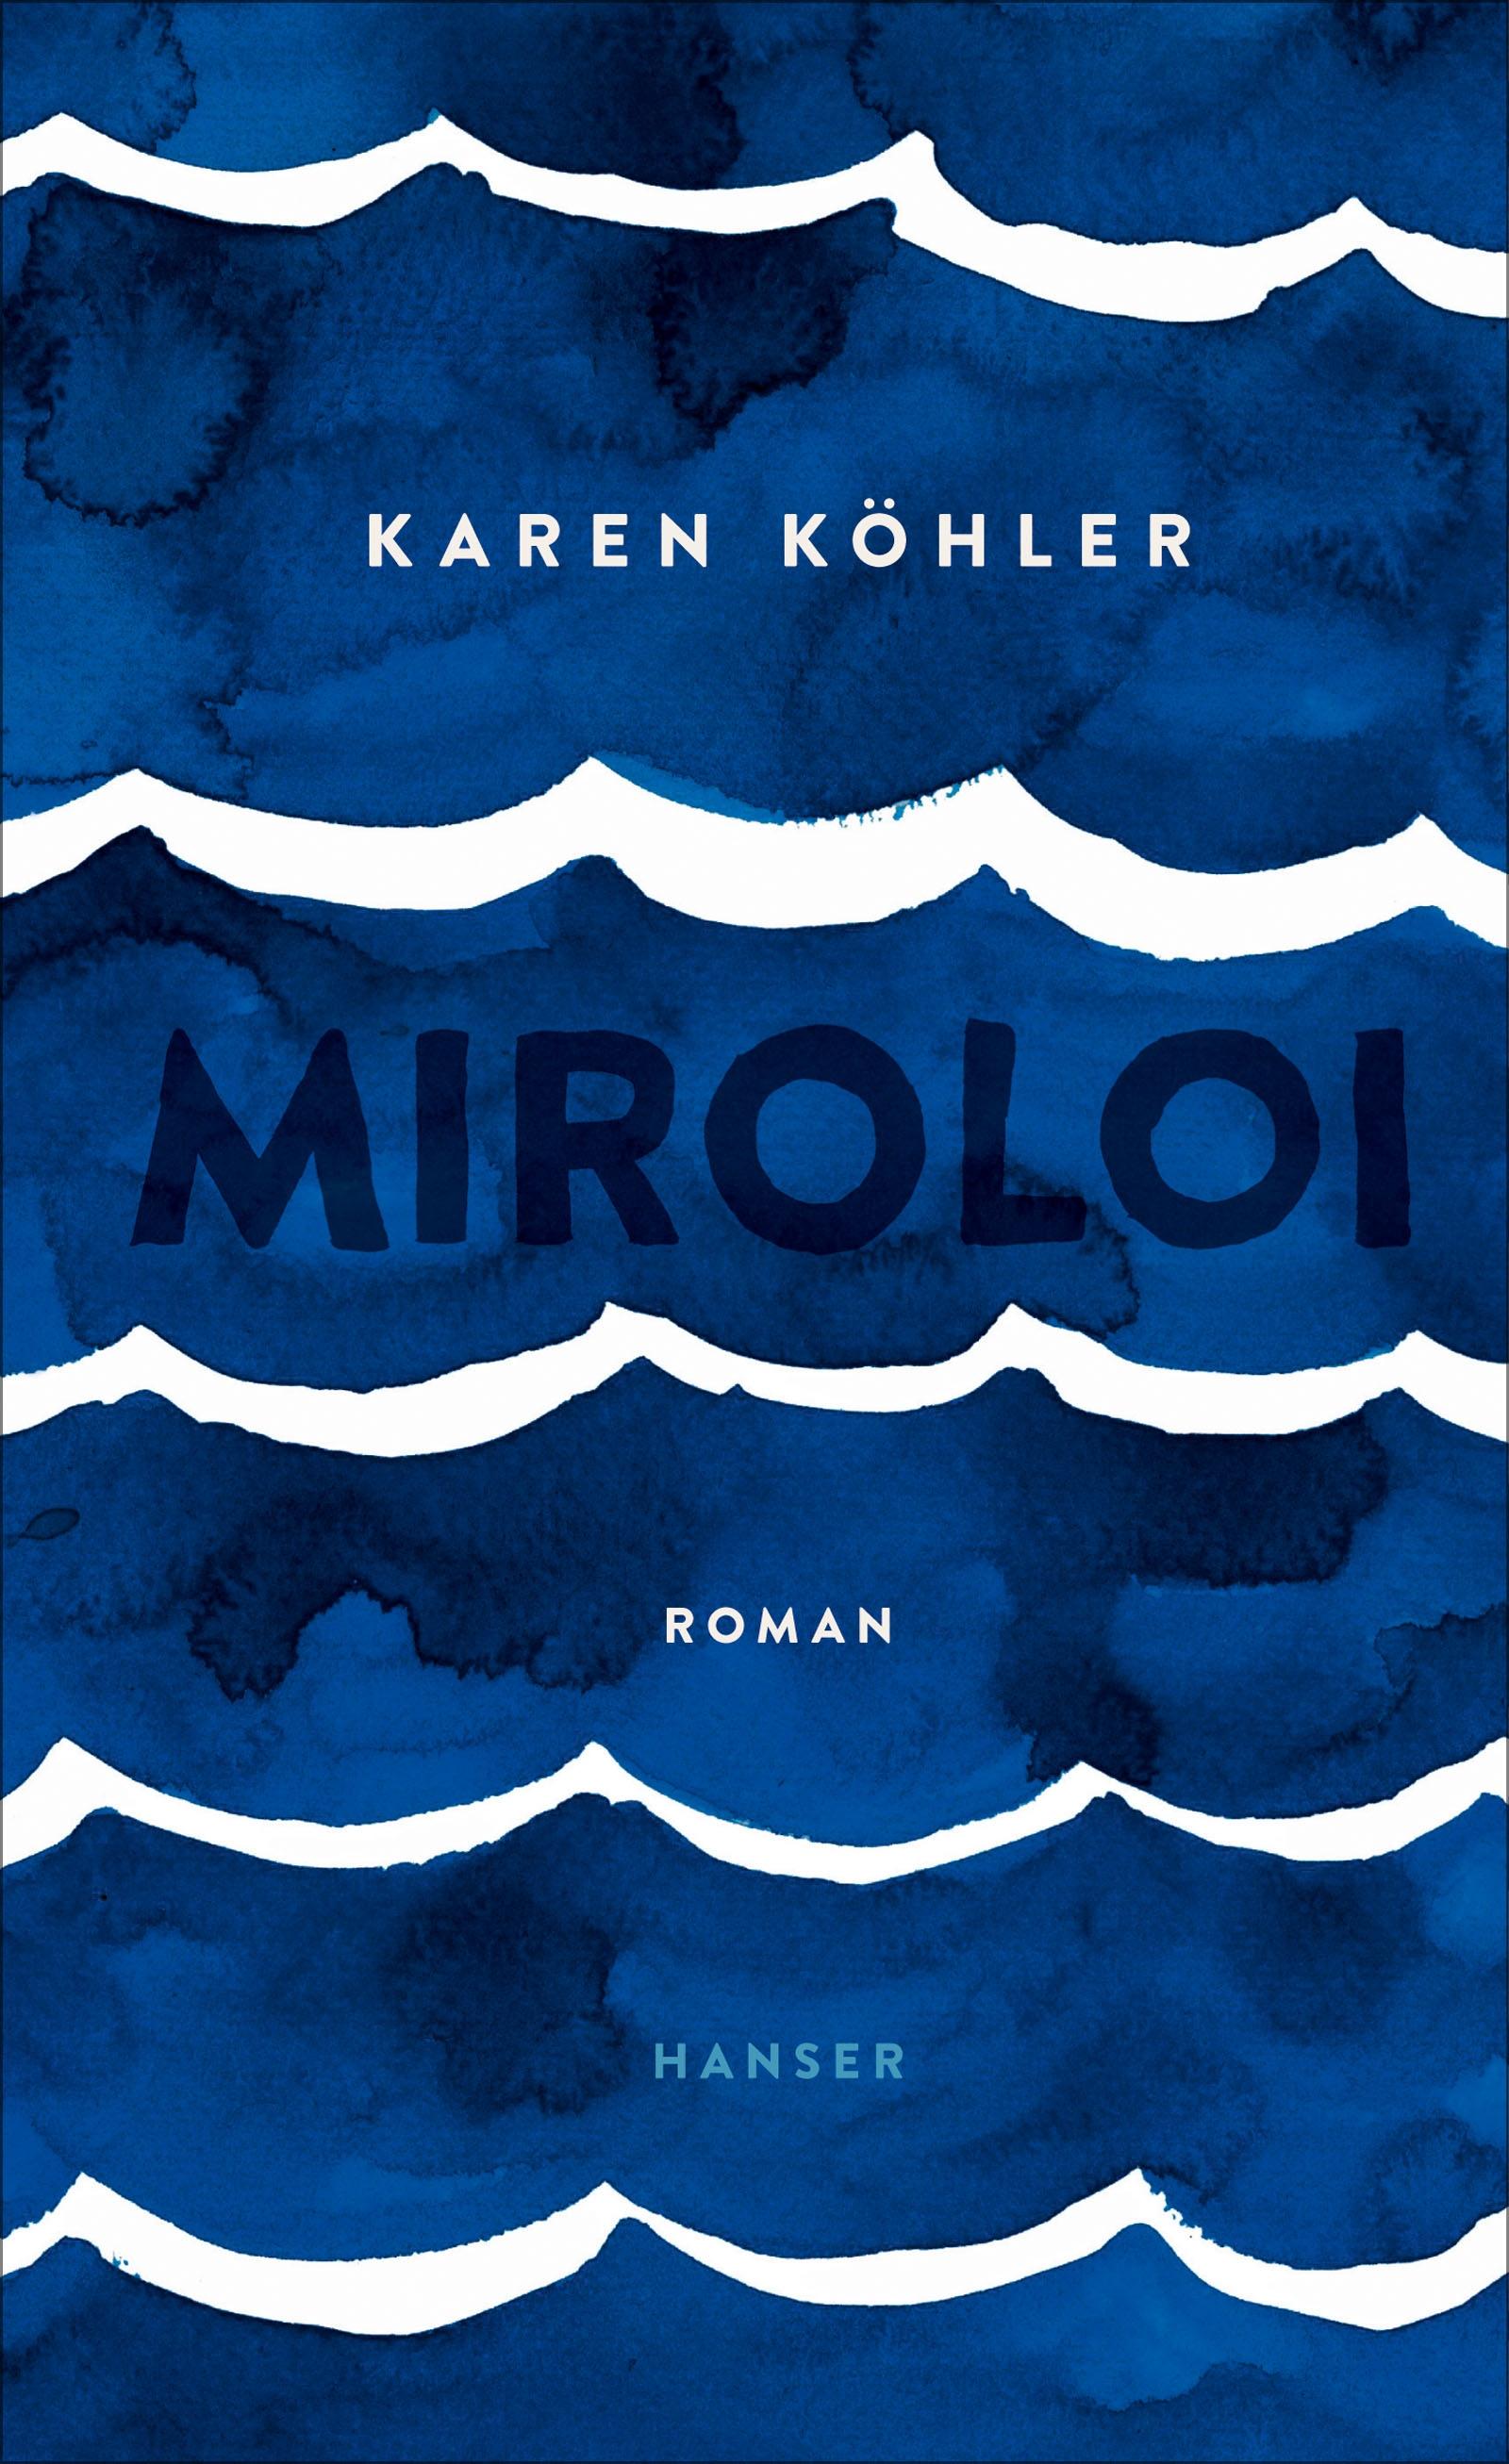 https://www.hanser-literaturverlage.de/buch/miroloi/978-3-446-26171-6/